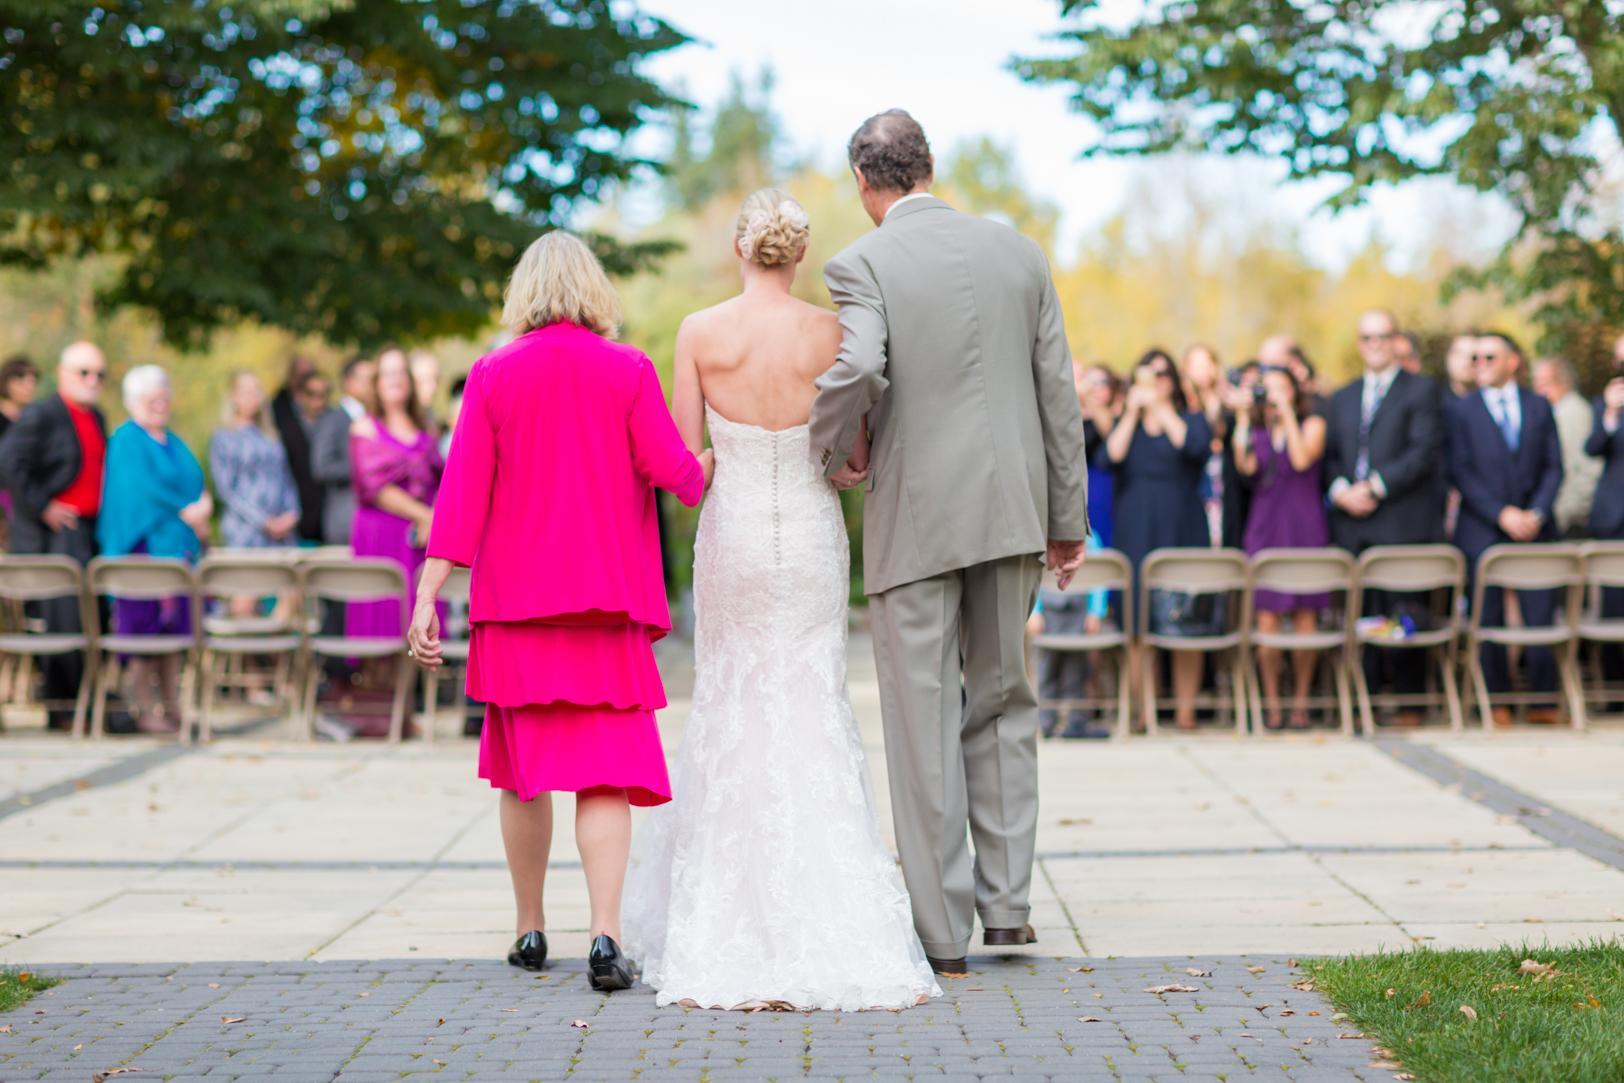 Wedding ceremony pictures at University of Alberta Devonian Botanic Garden